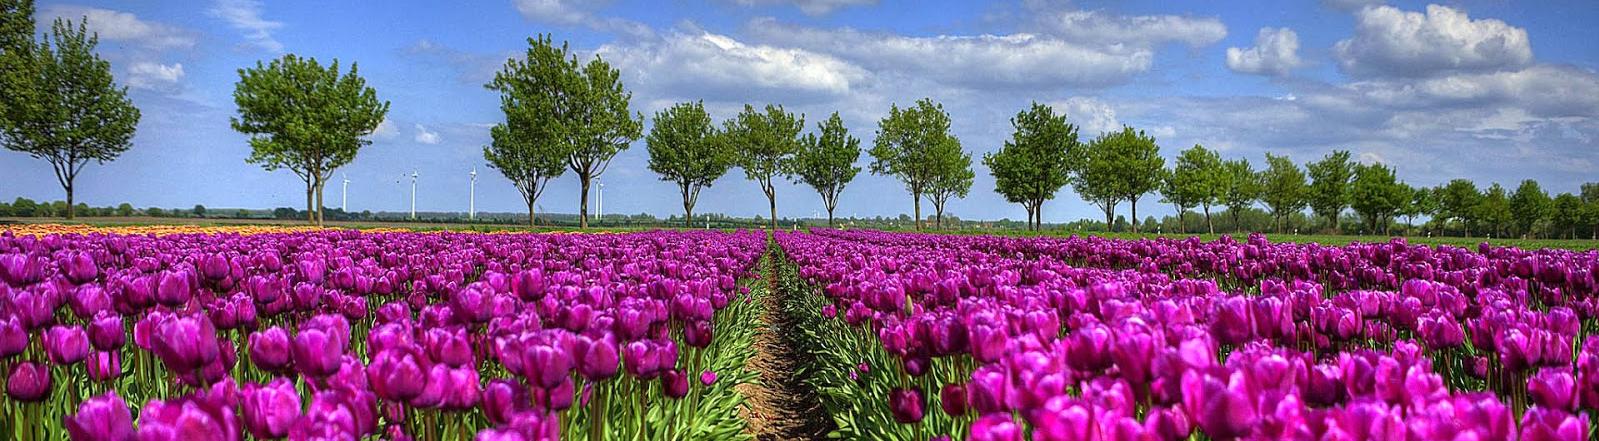 foto-veld-vol-hollandse-tulpen-achtergrond-lente-wallpaper-1599x441